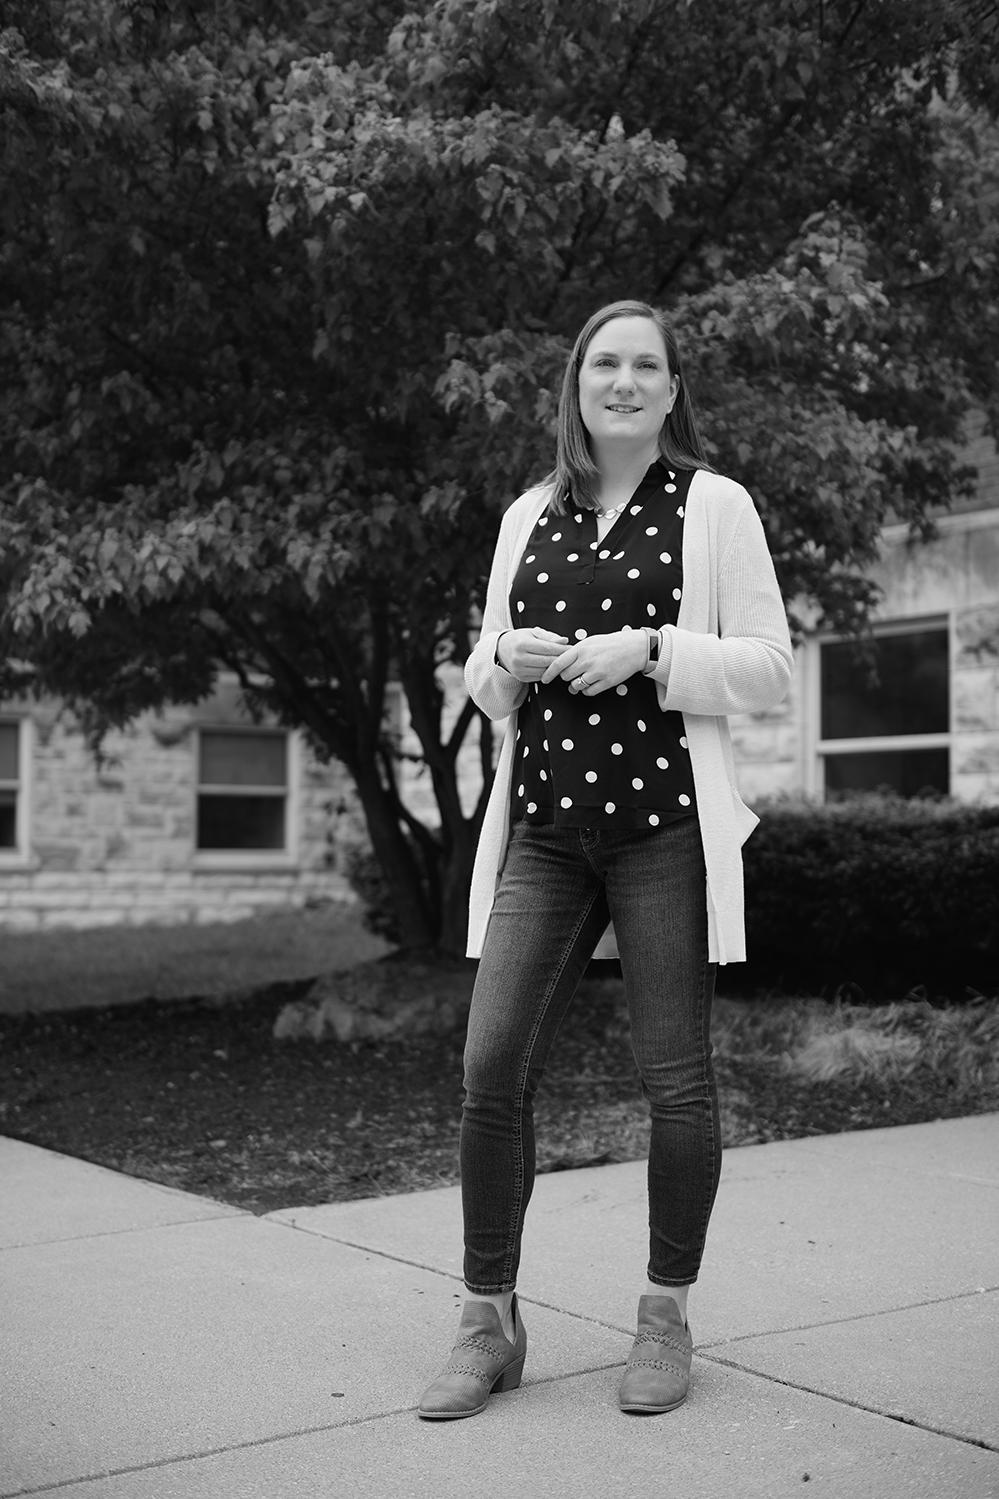 Jennifer Nelson, PCM - Content SpecialistKSGilmore Consulting LLCjennifer@ksgilmore.com